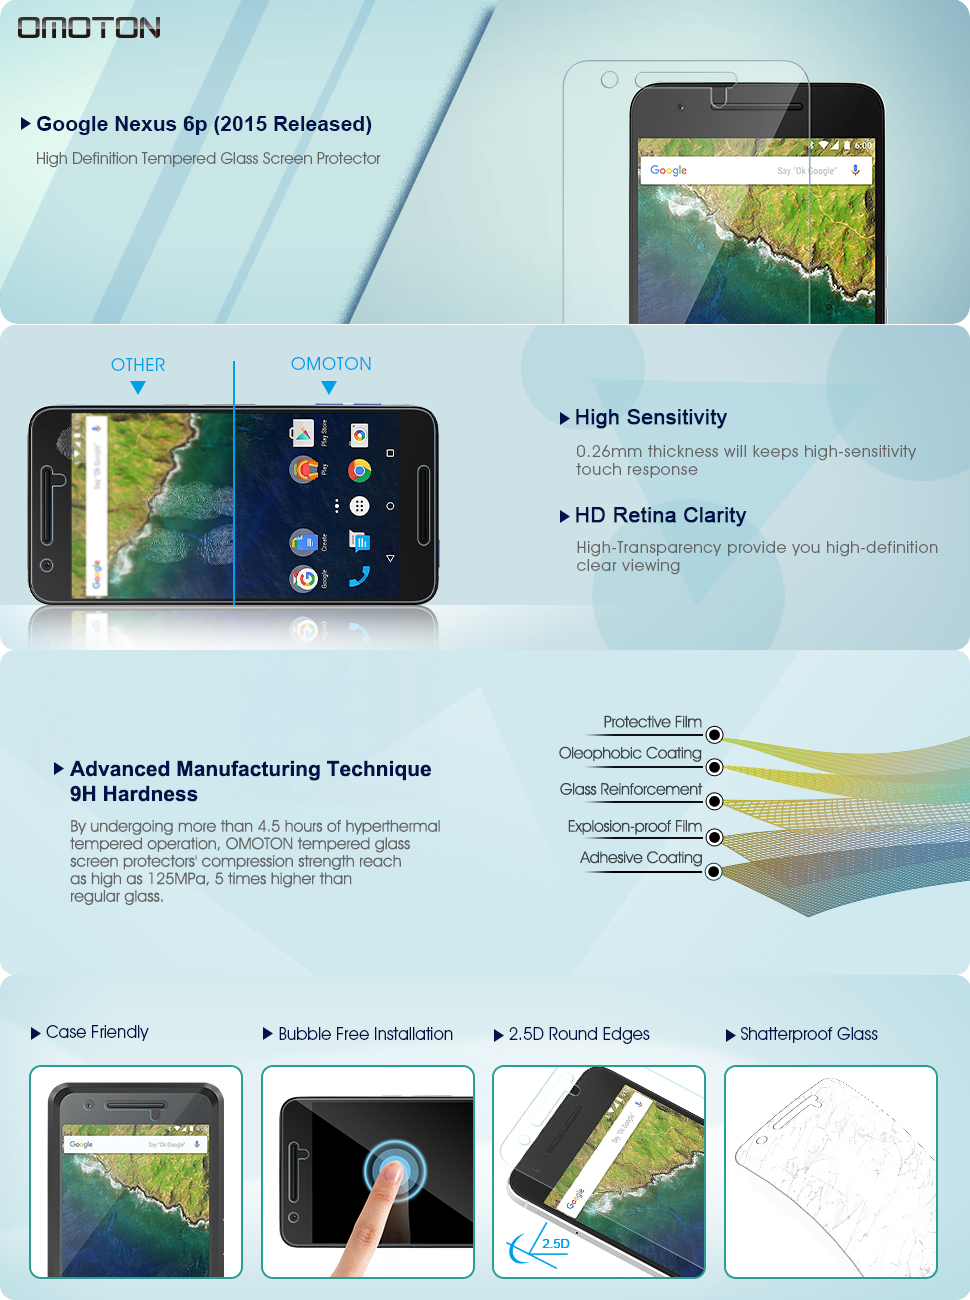 Omoton Google Nexus 6p Tempered Glass Screen Protector